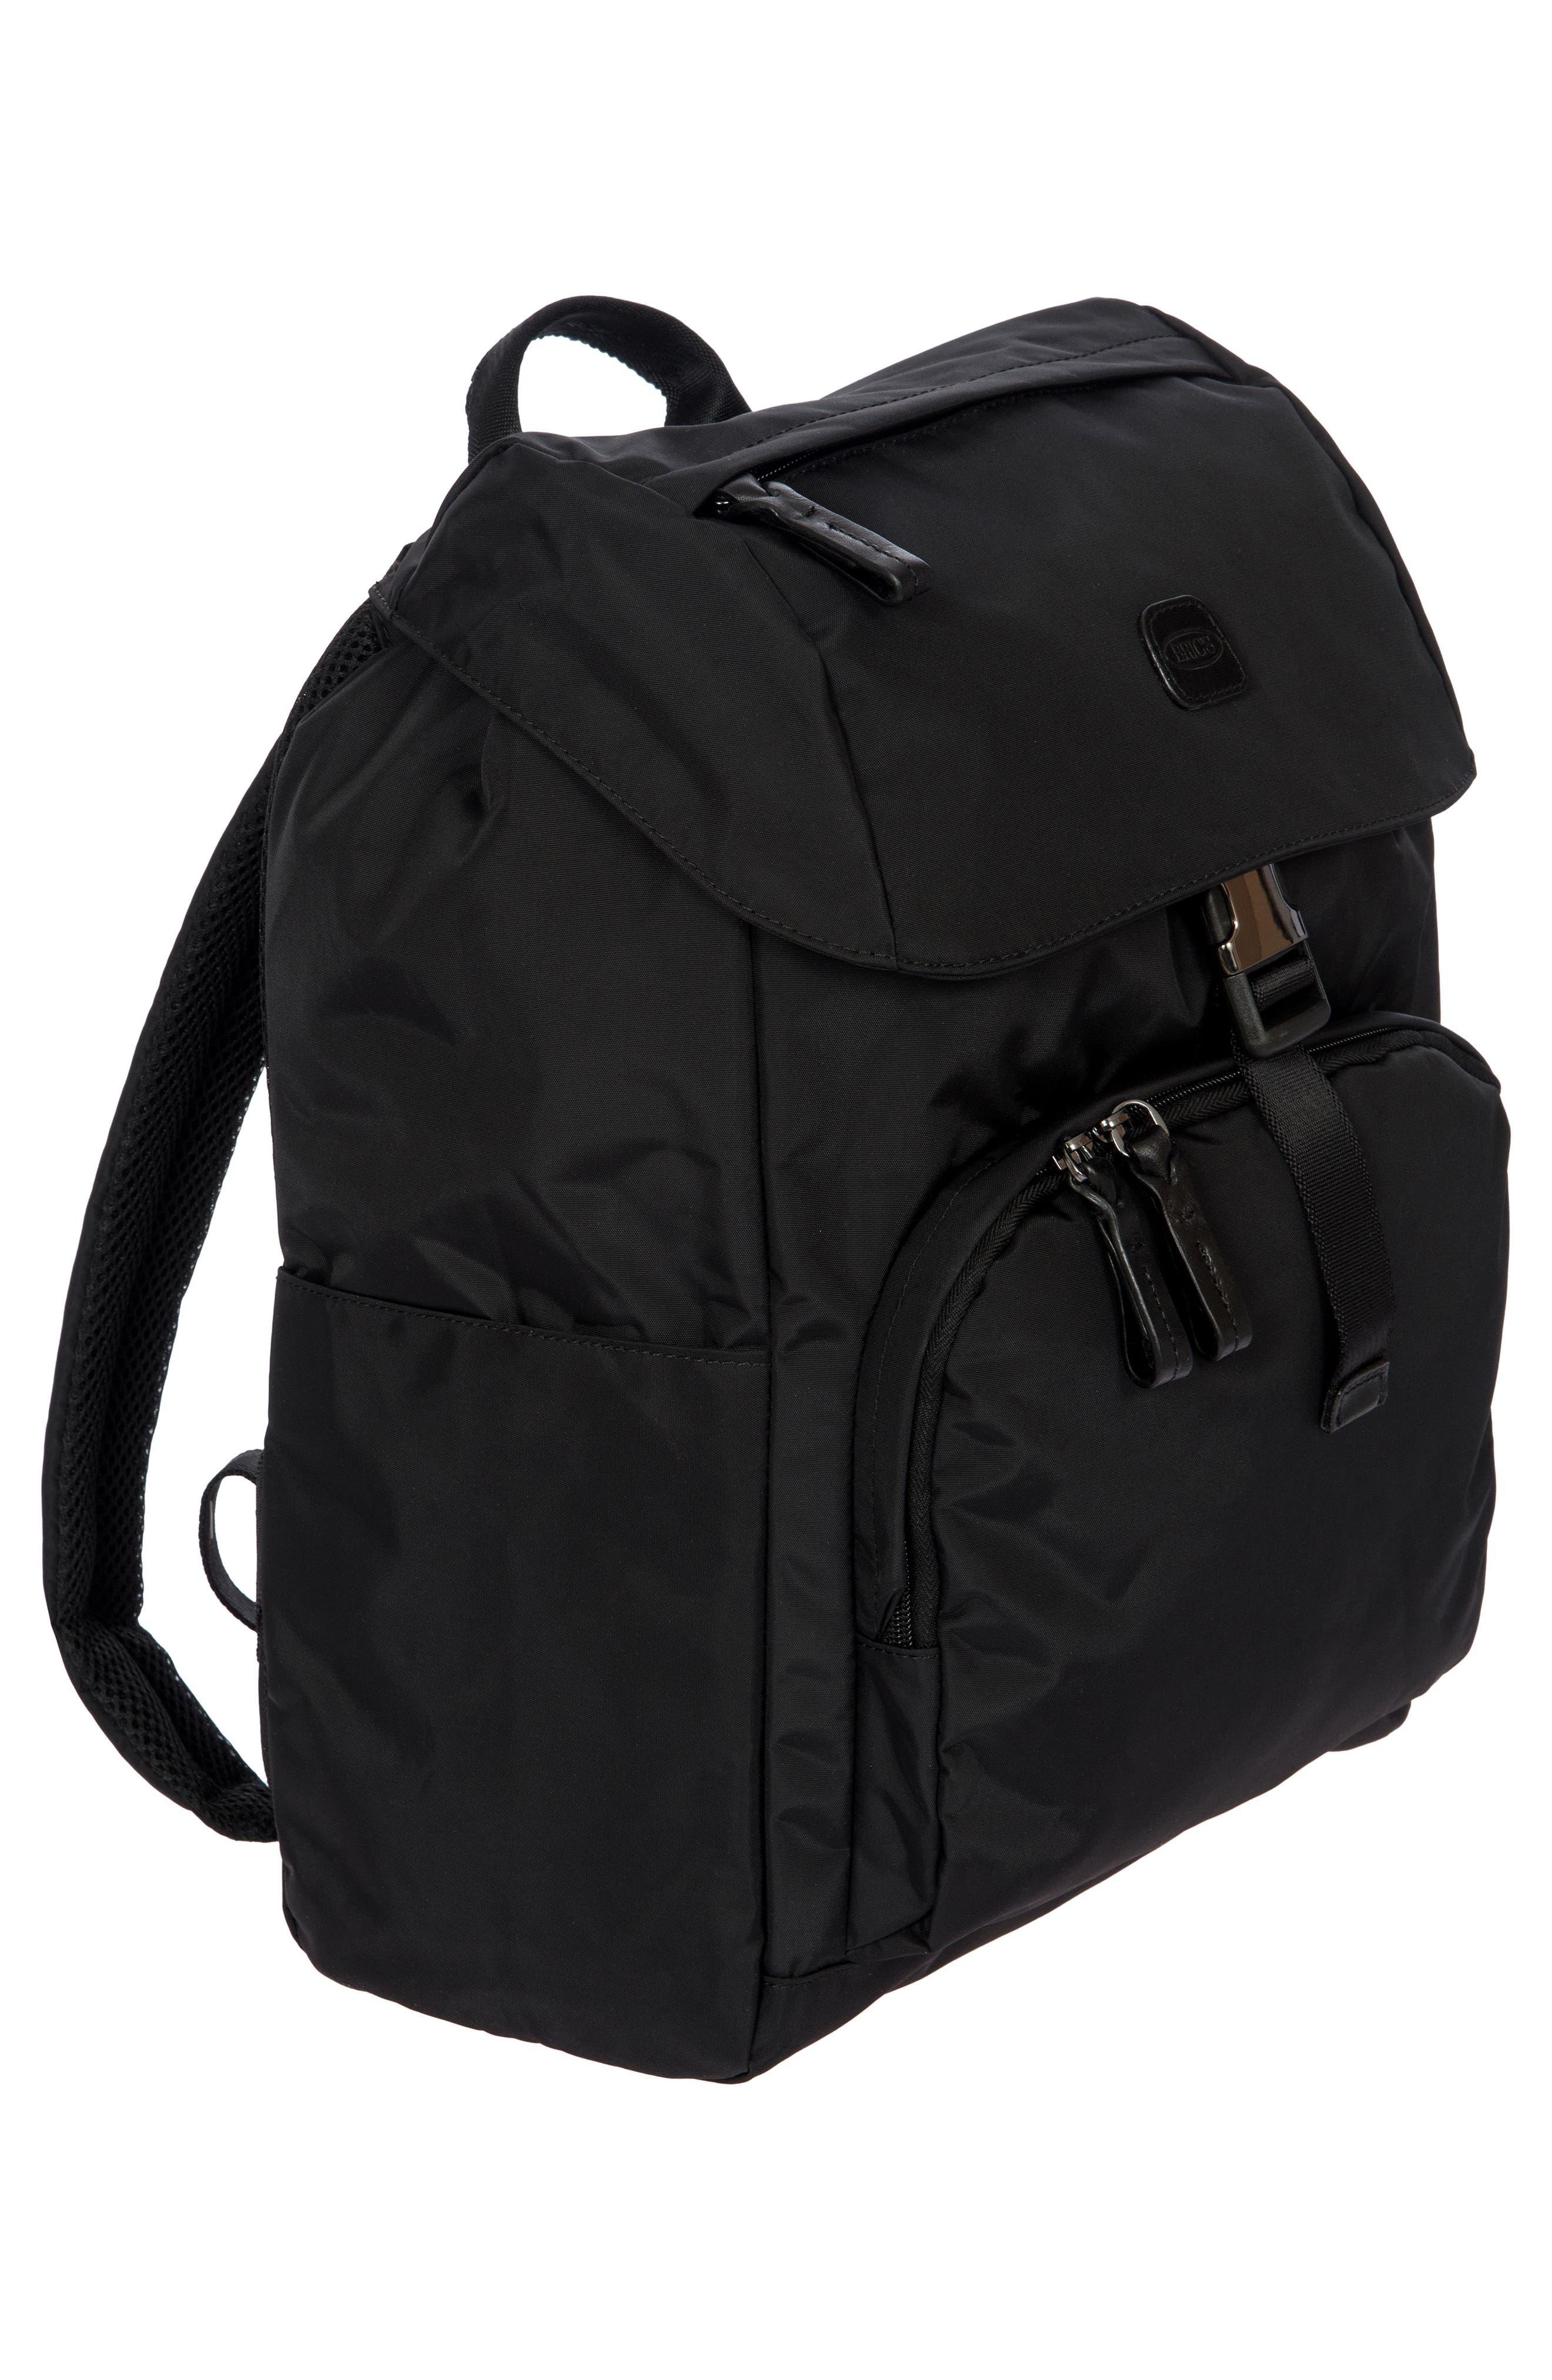 X-Bag Travel Excursion Backpack,                             Alternate thumbnail 6, color,                             BLACK/ BLACK